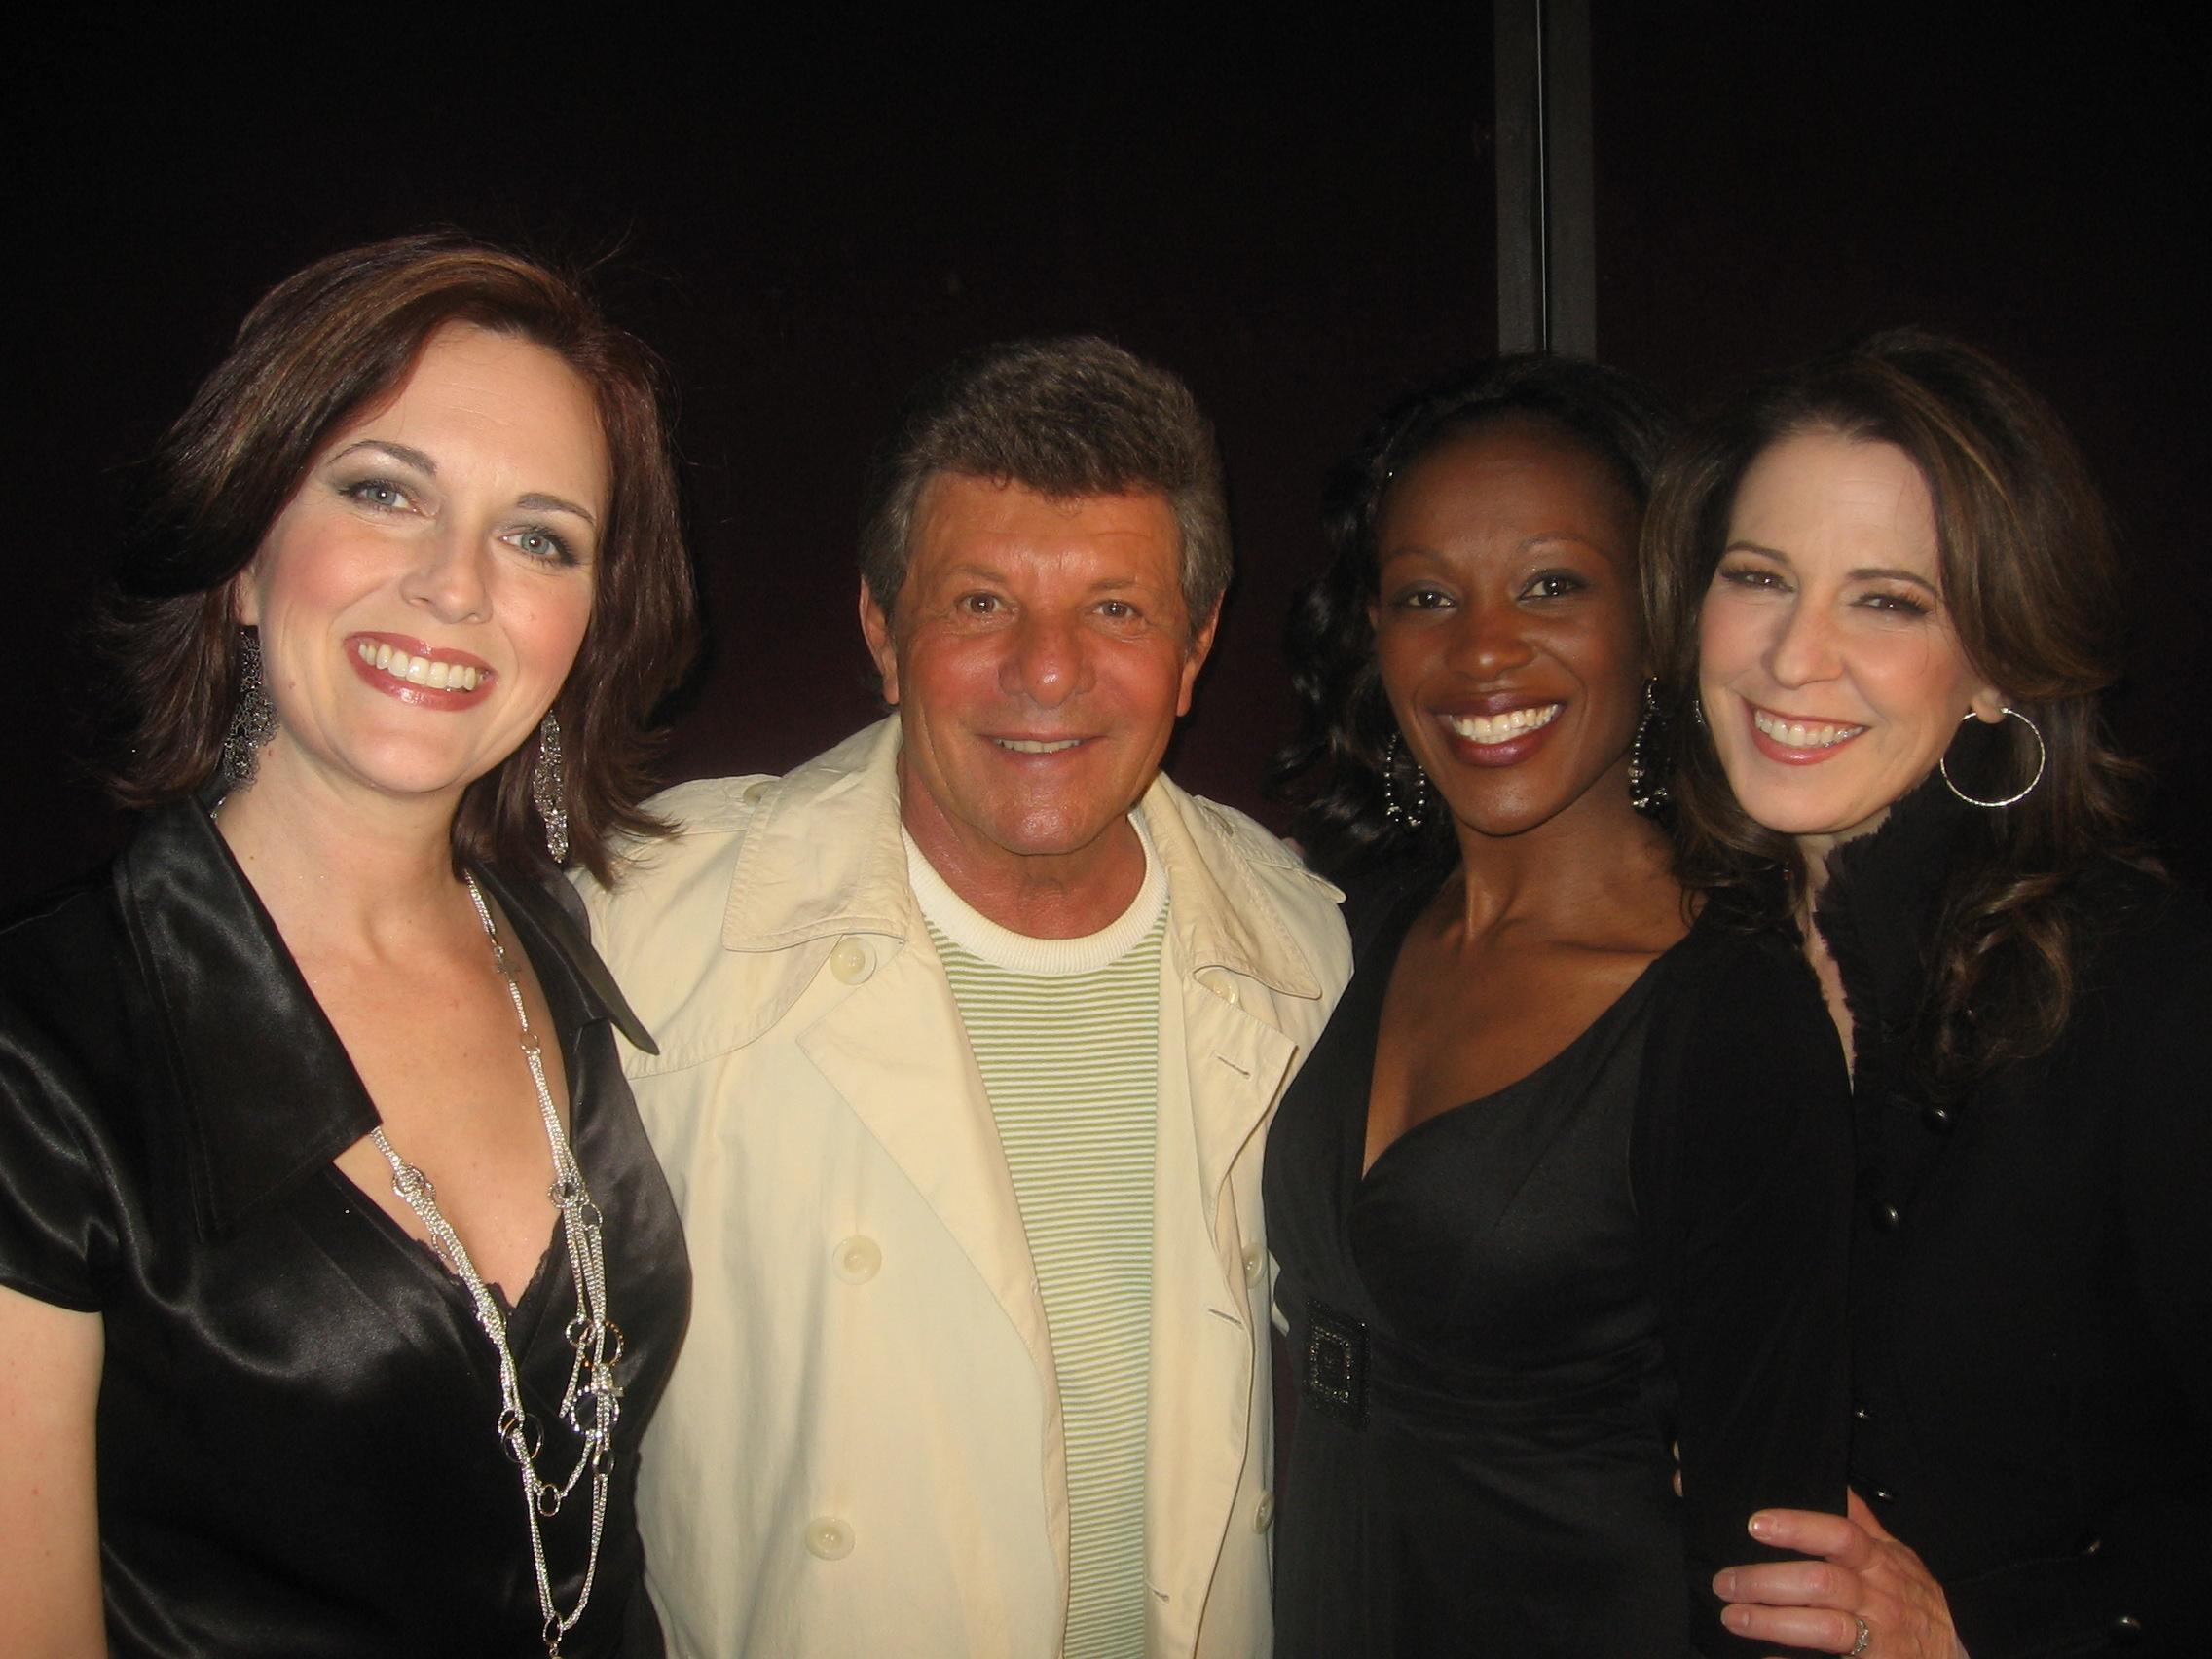 Backup singers for Frankie Avalon with Kristina Pruitt and Tiffany Nesbit Jones